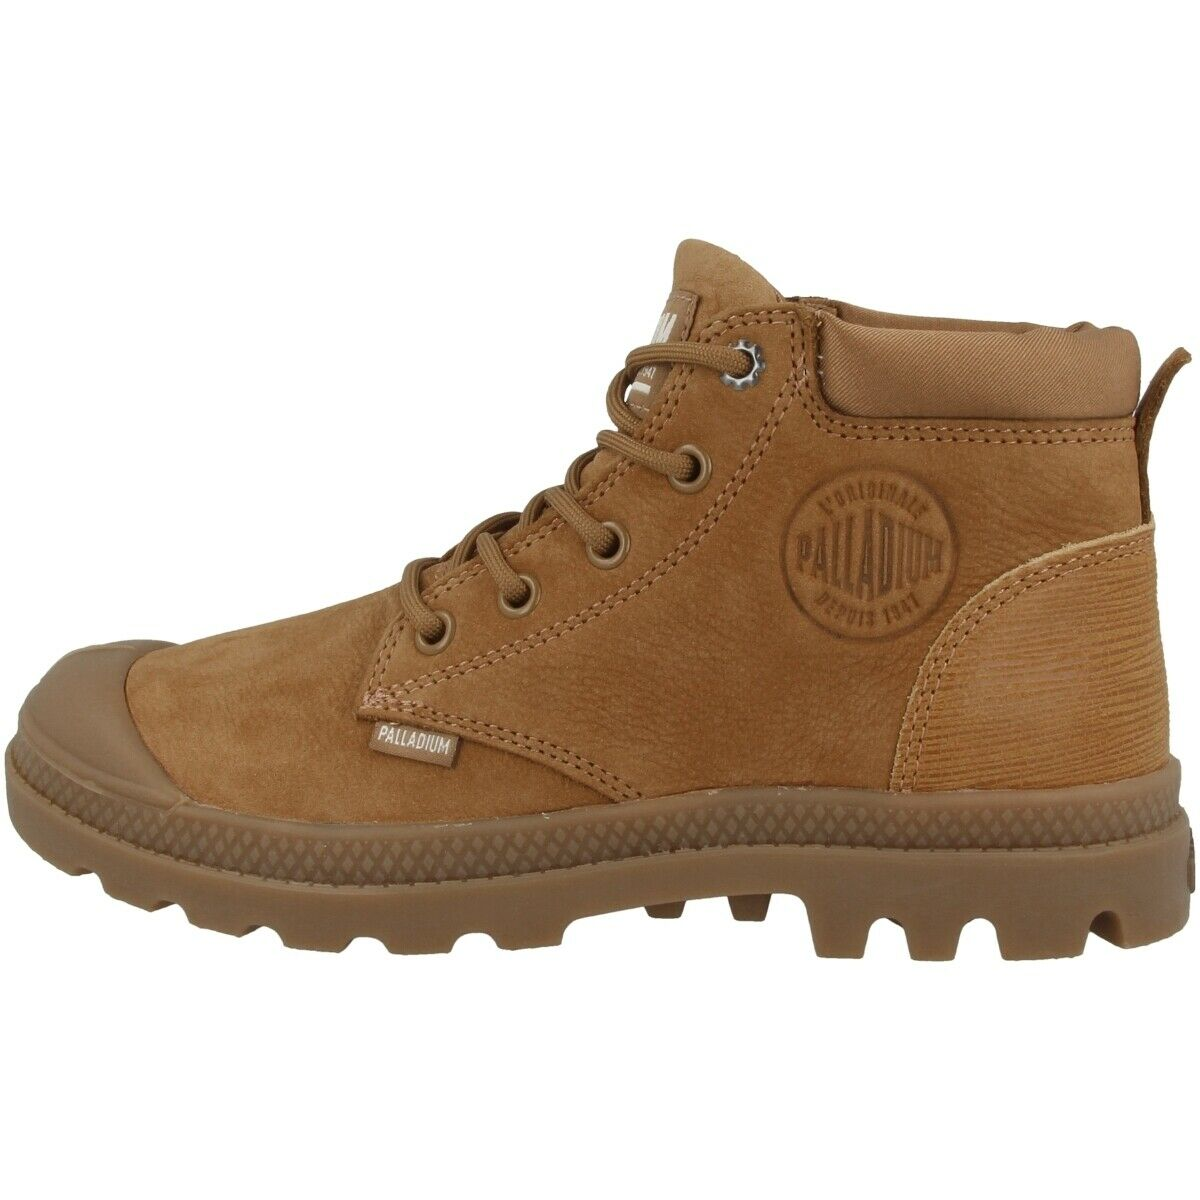 Palladium Pampa Lo Cuff Leather damen Schuhe Mid Cut Turnschuhe mahogany 95561-257